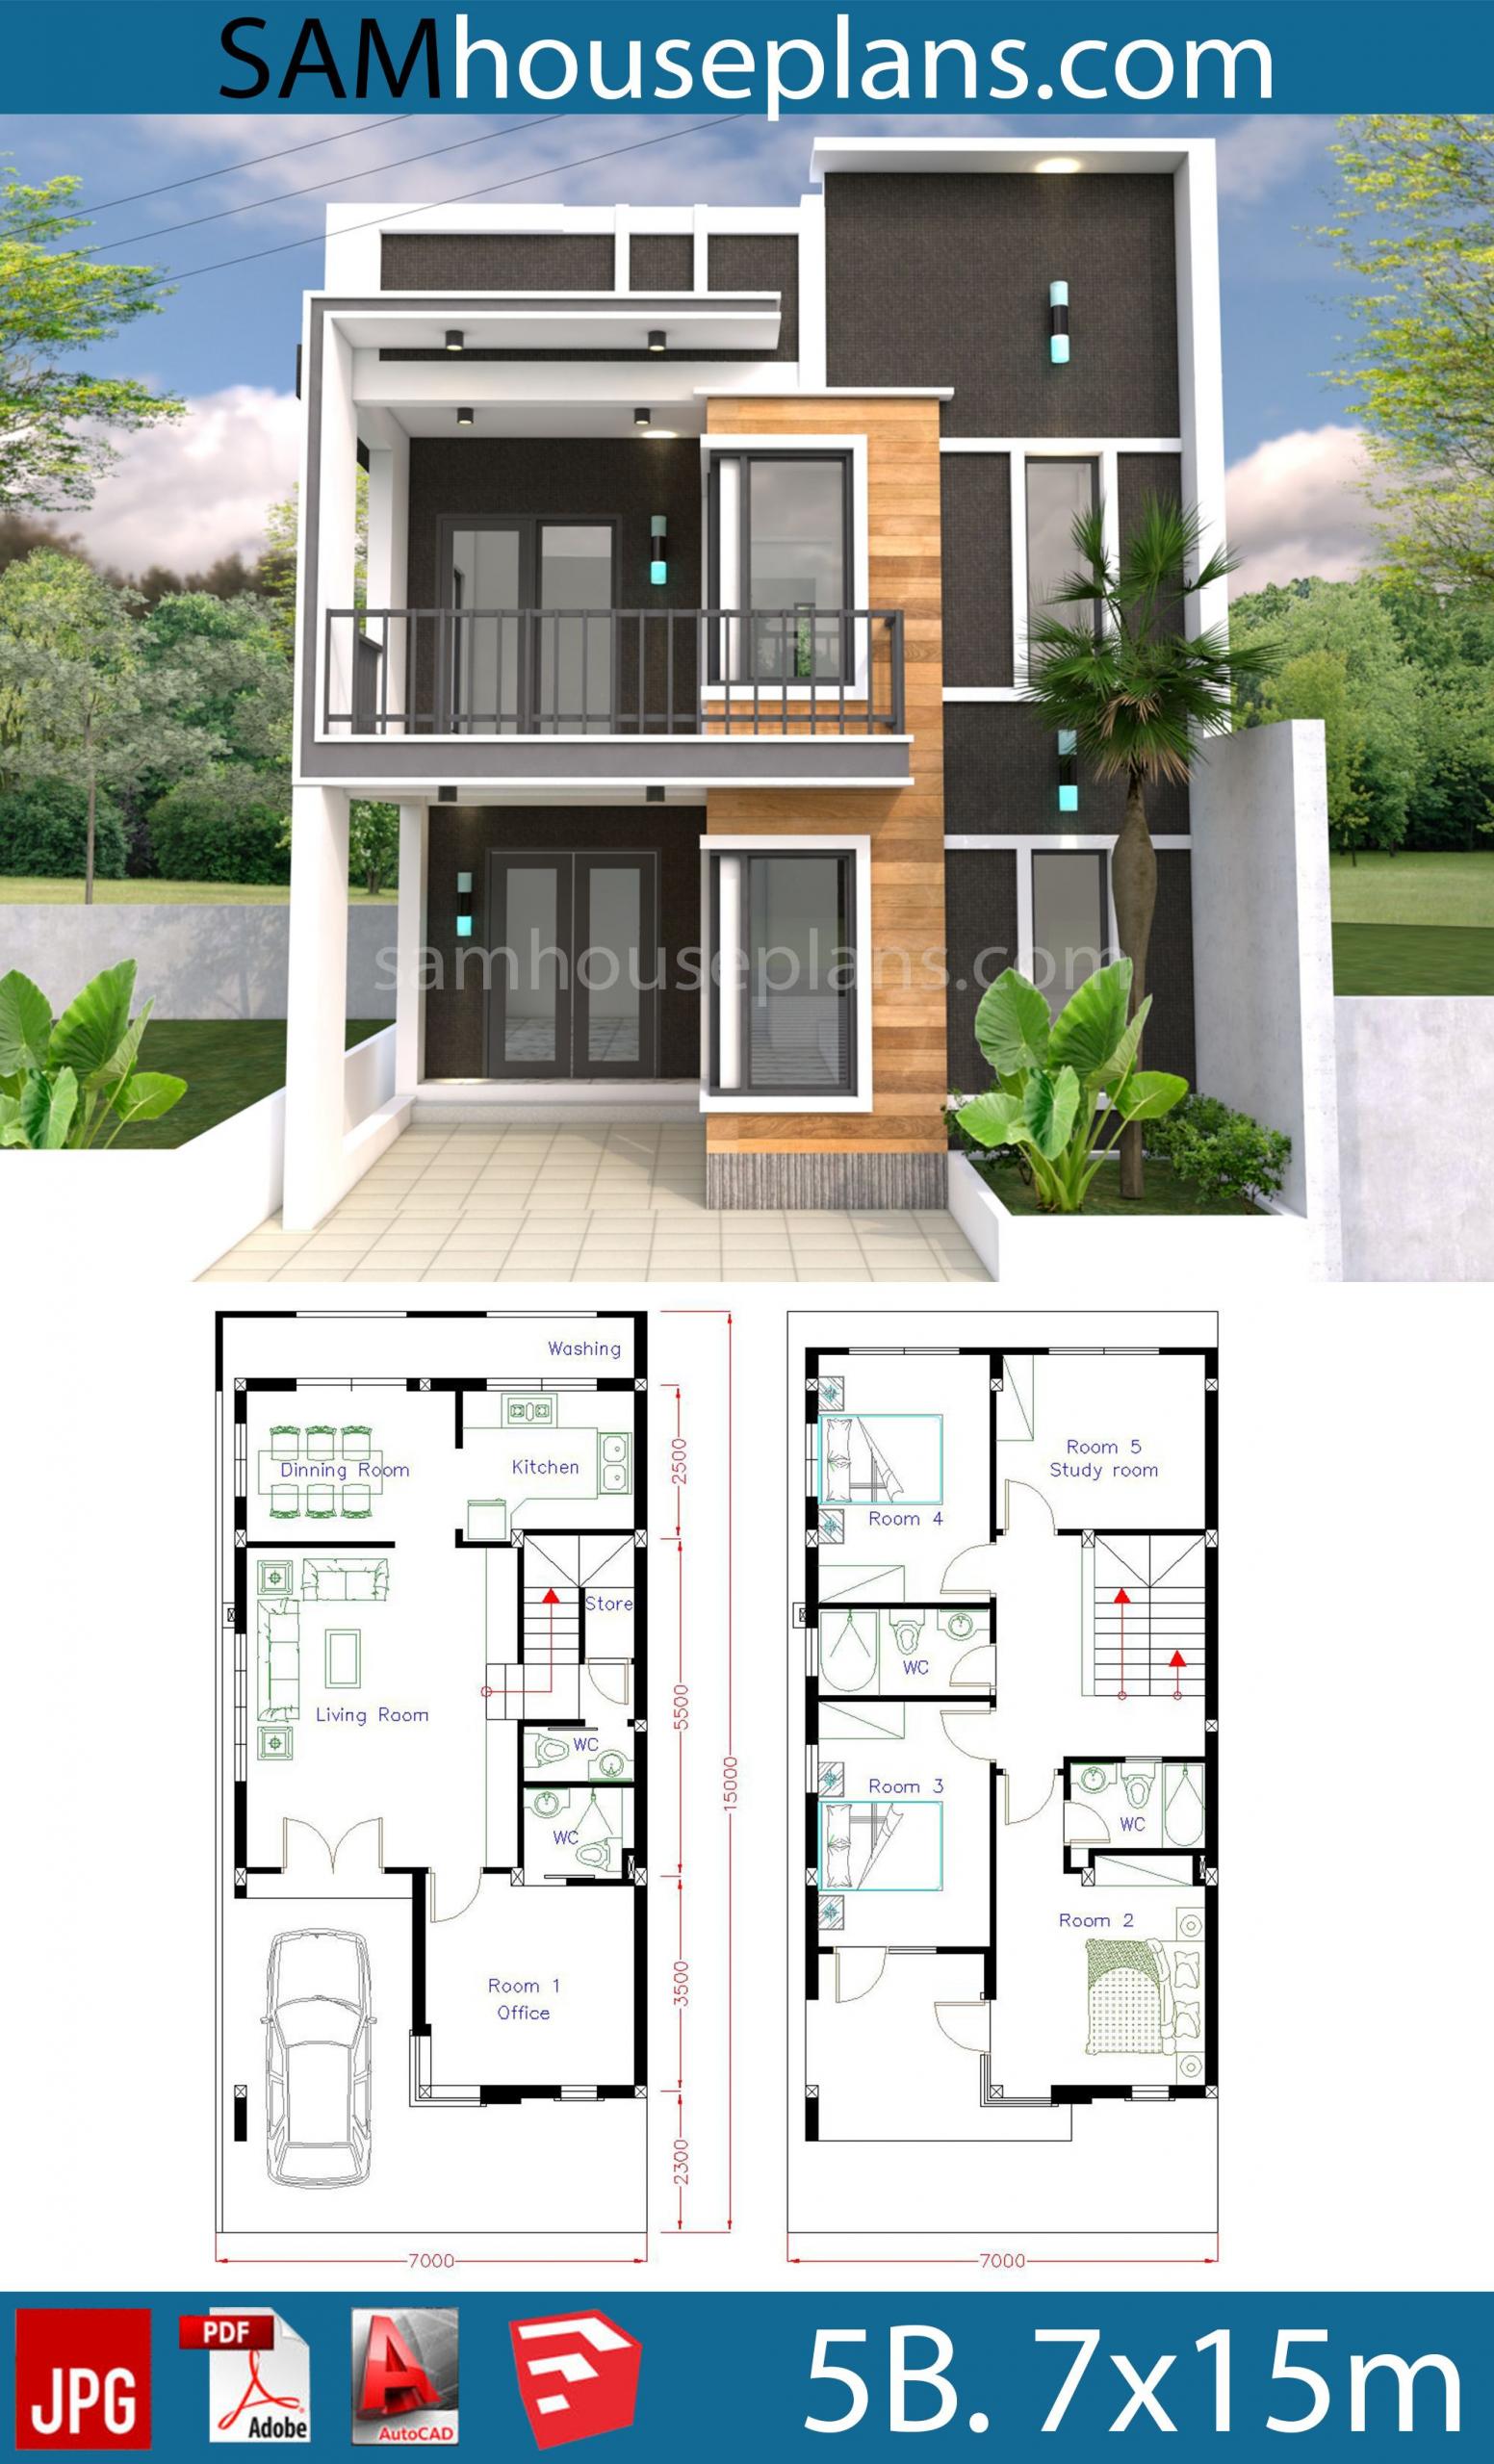 2 Story 4 Bedroom House Plans Modern Design House Design Plan 9 12 5m With 4 Bedrooms House In 2020 House Construction Plan Model House Plan Duplex House Design